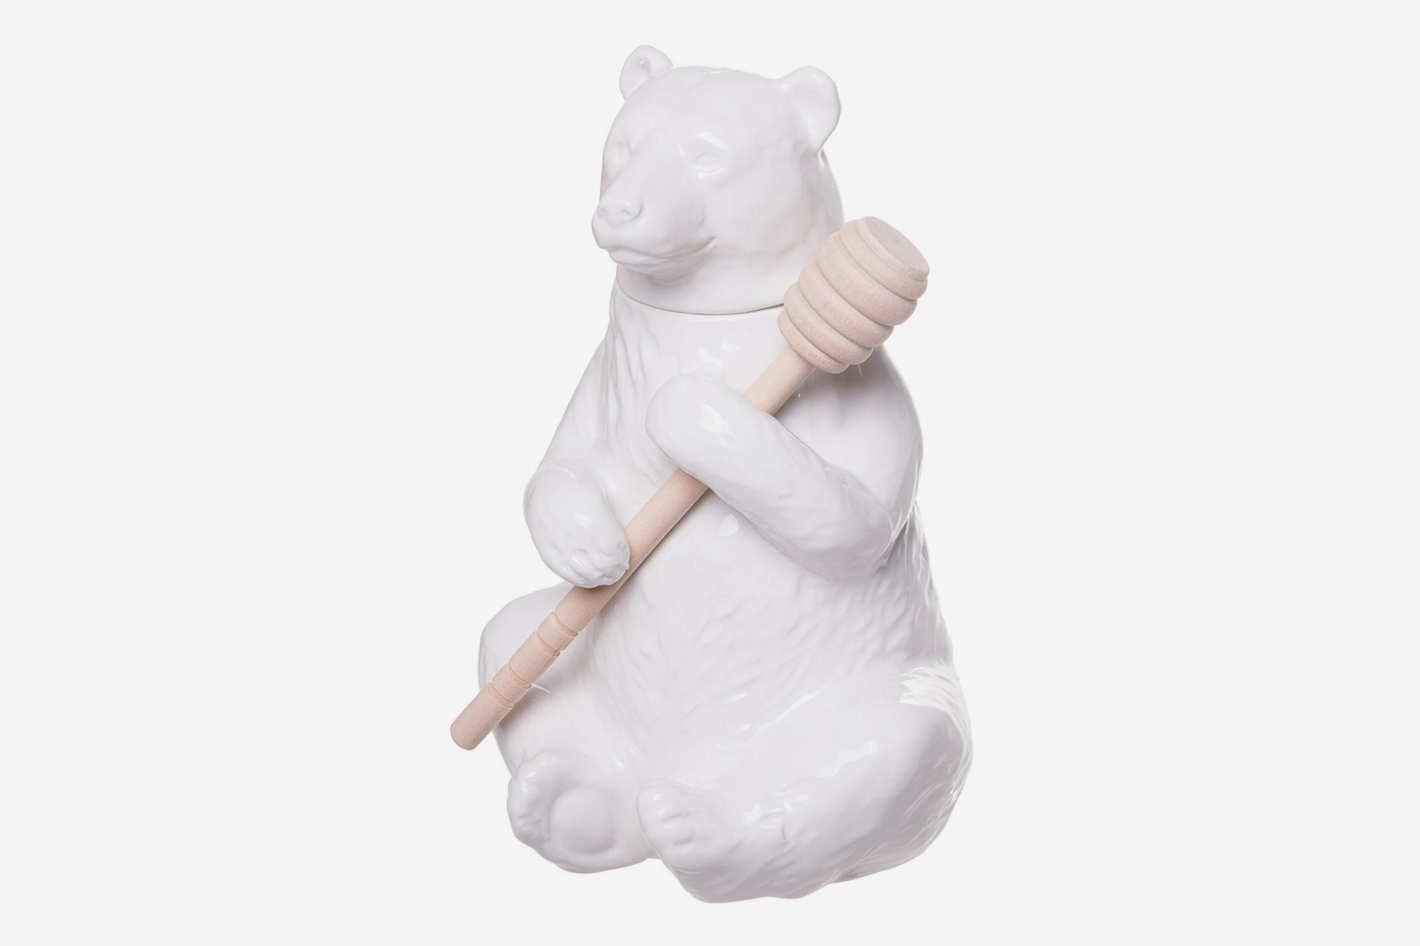 Red Co. Charming Ceramic Bear Honey Pot with Bamboo Honey Dipper